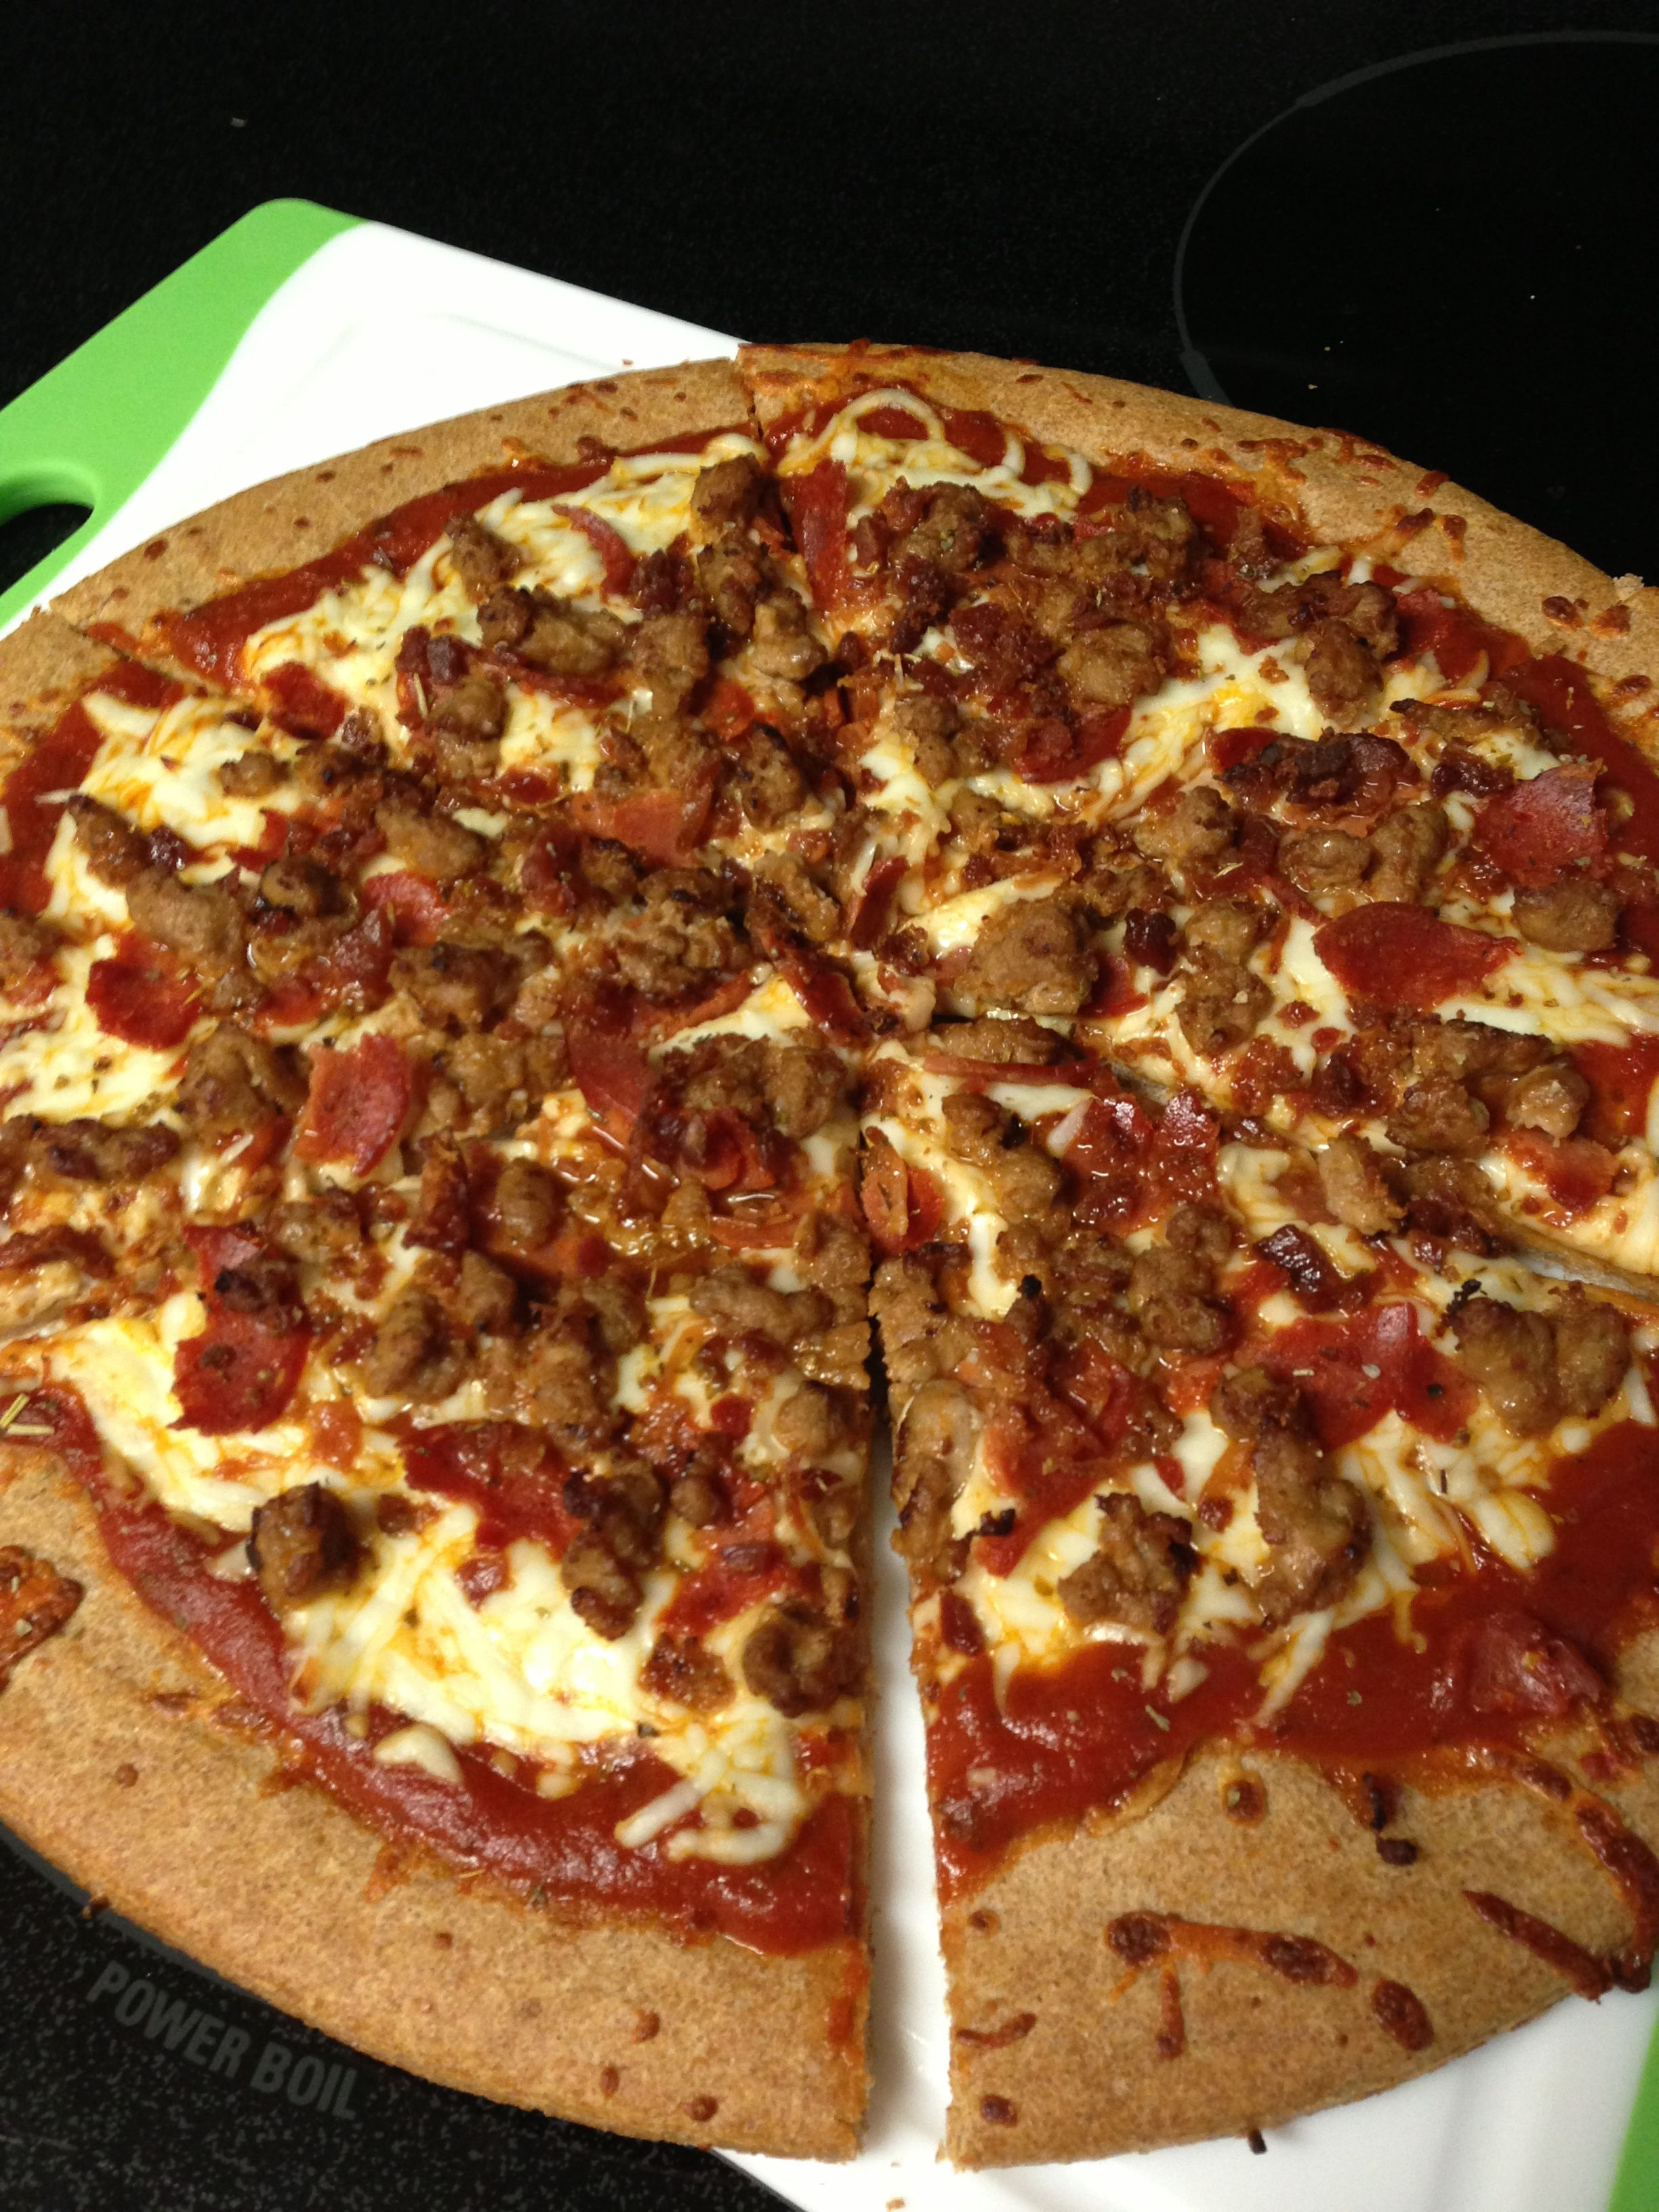 Meat Lover Pizza : lover, pizza, Lover's, Pizza, Emily, Bites, Recipe, Lovers, Pizza,, Homemade, Recipe,